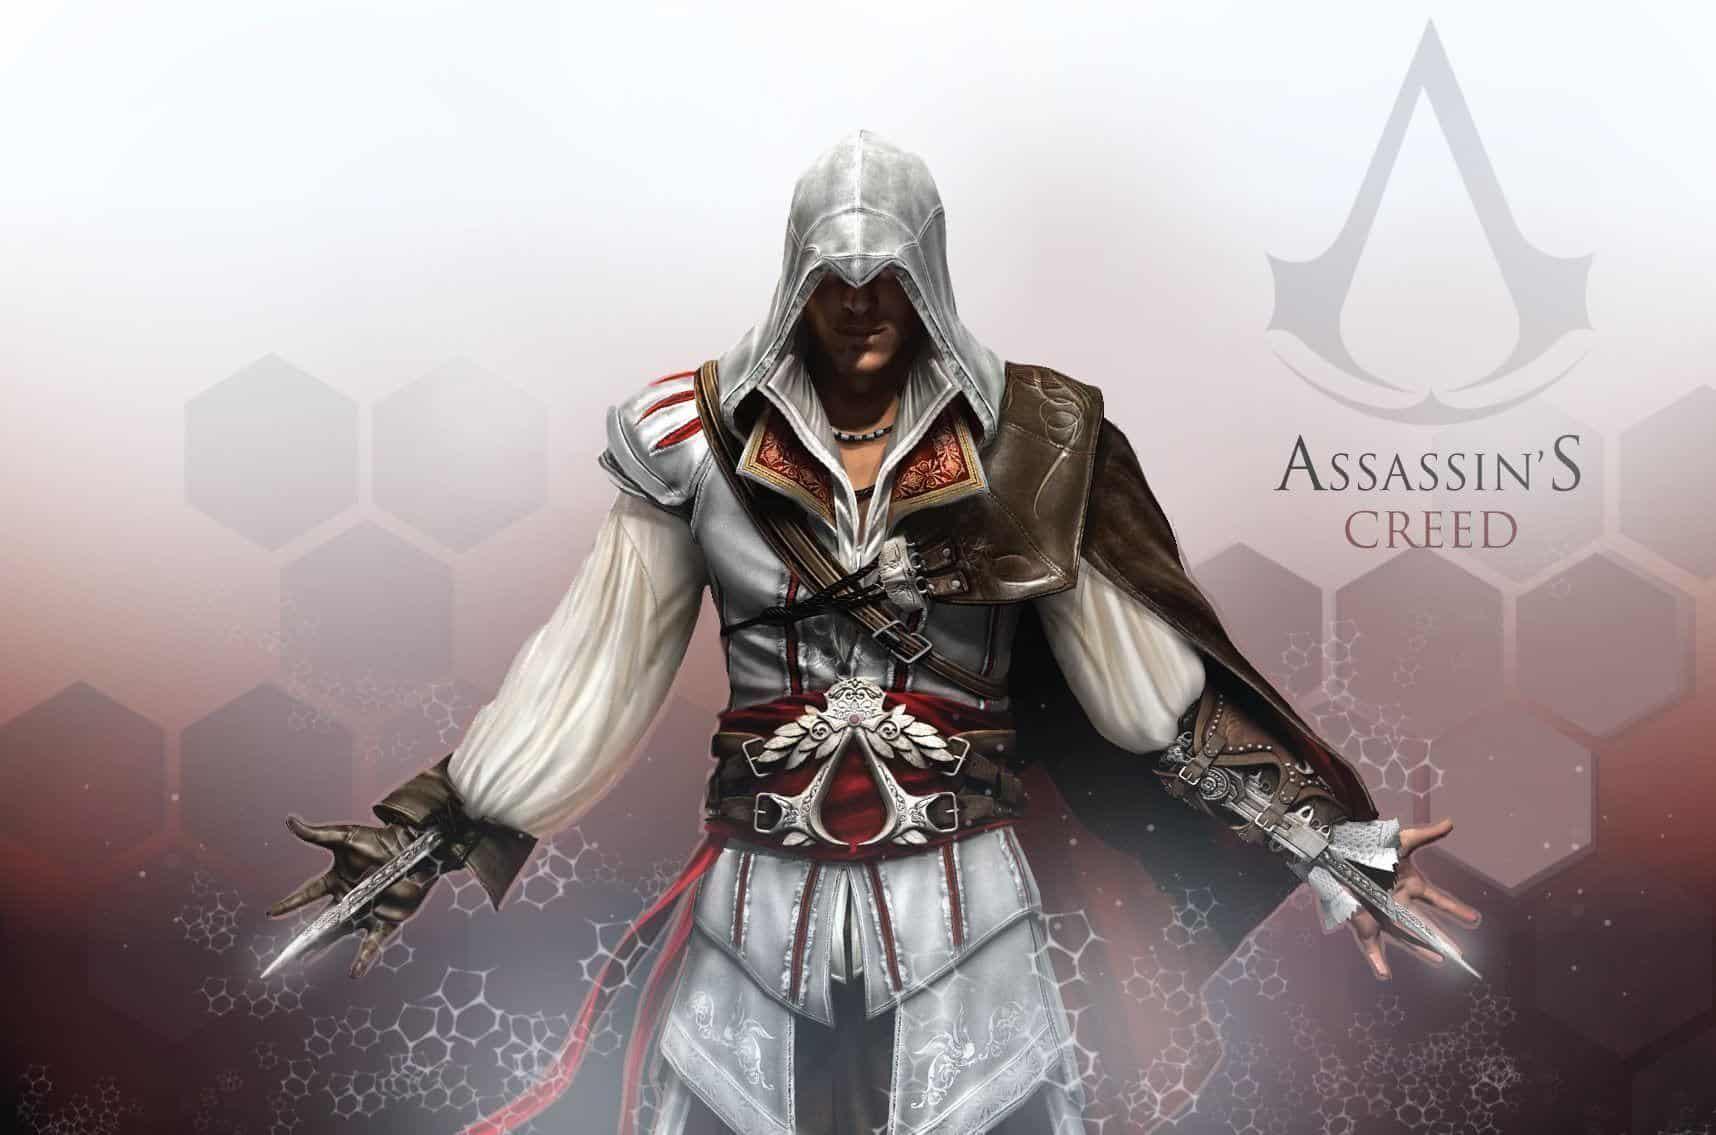 Best Assassins Creed Games - Assassins Creed II